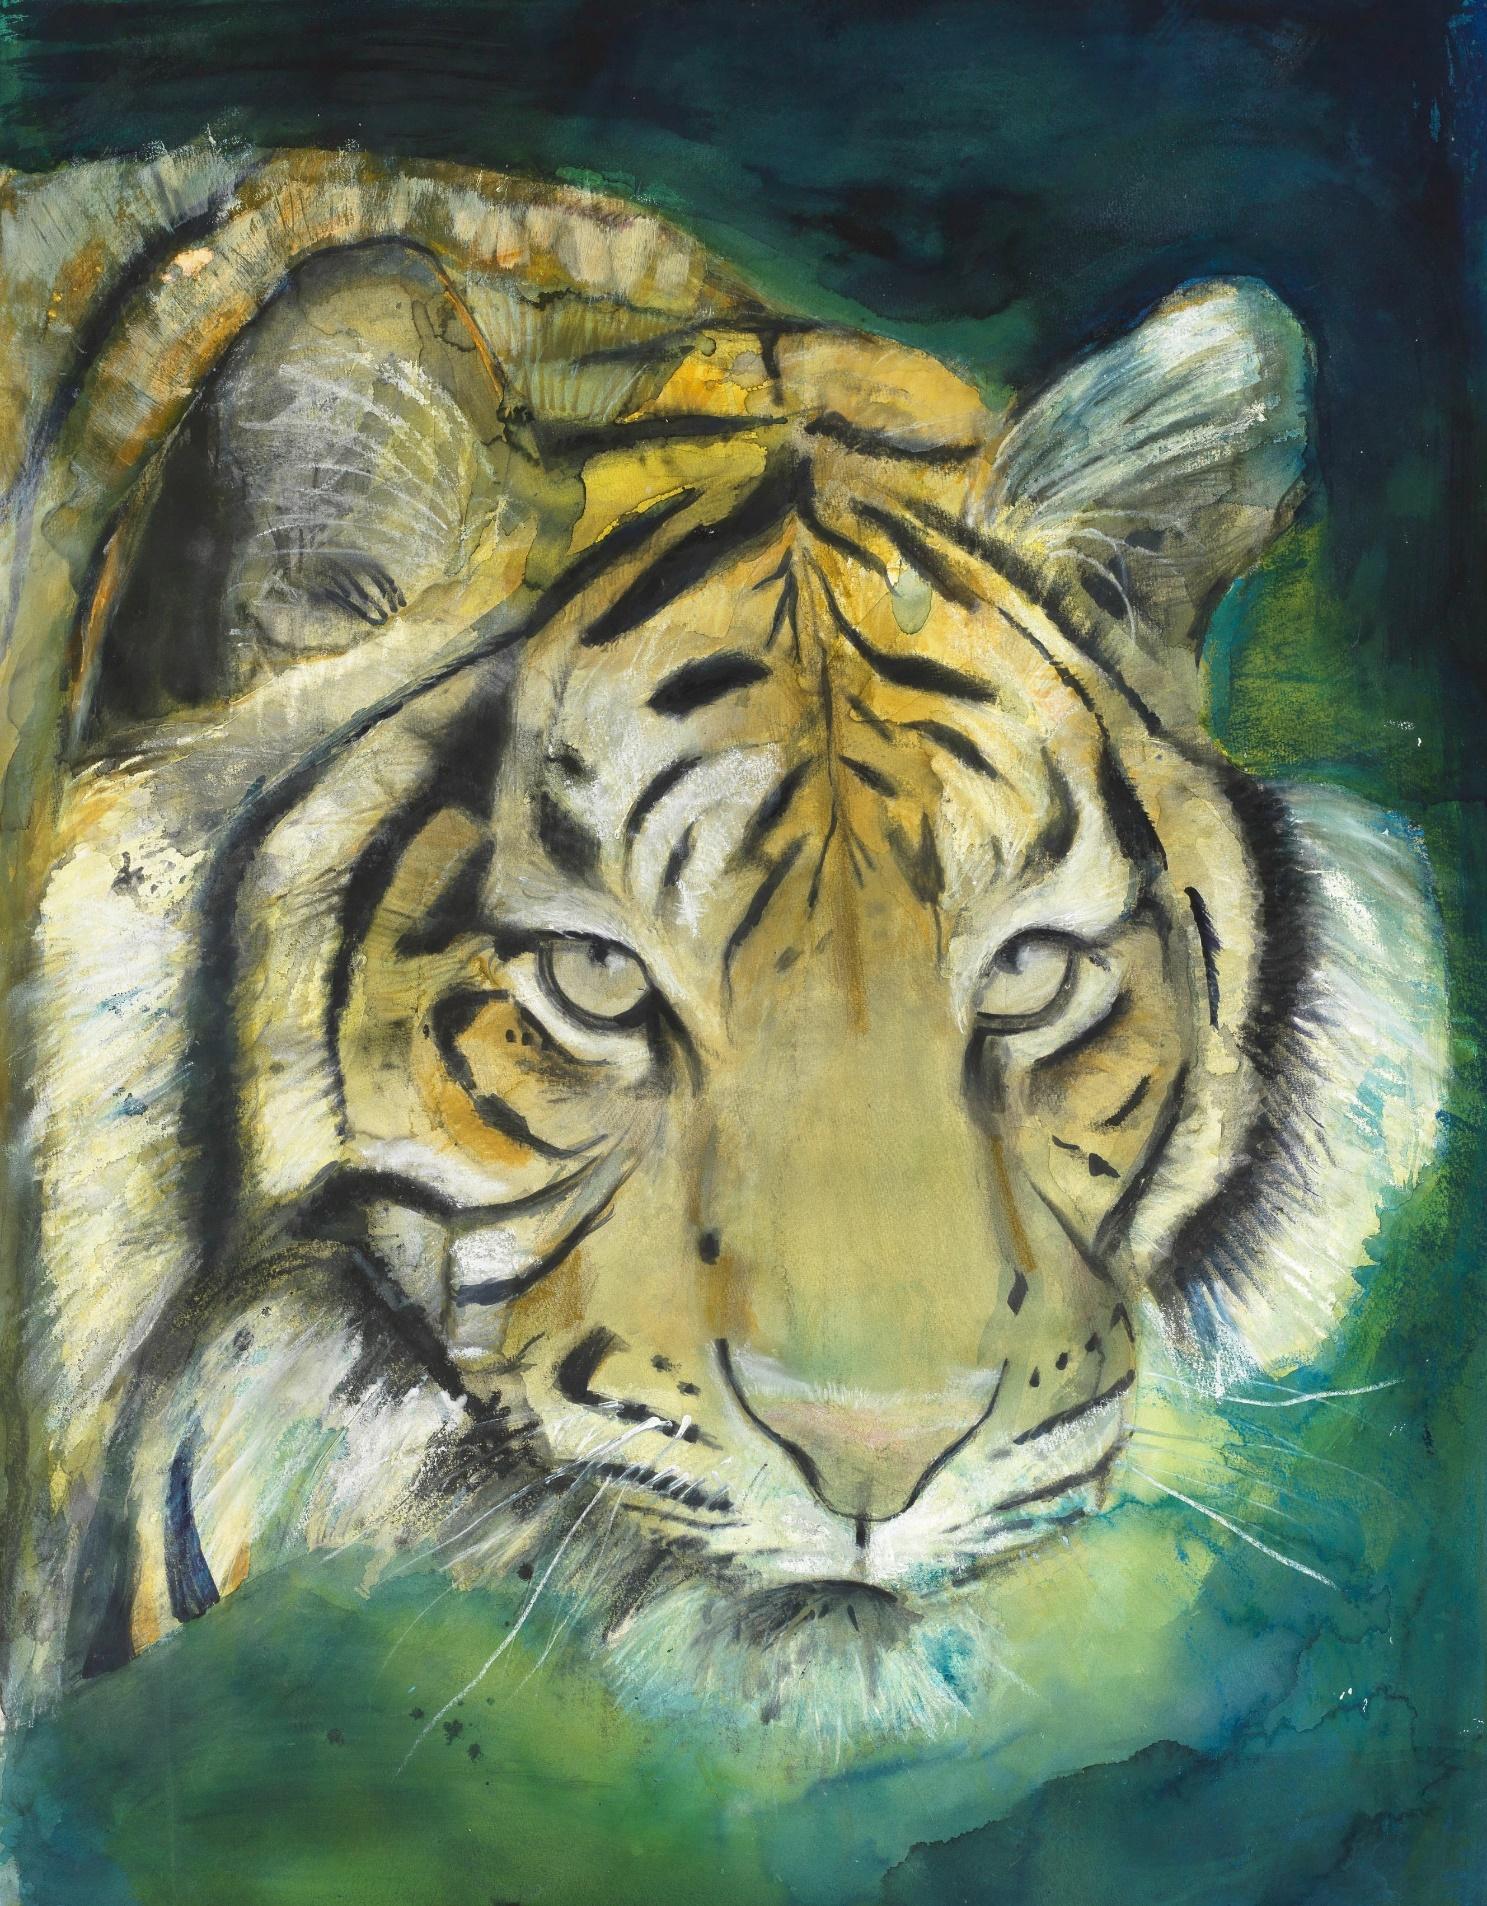 圖5. Russ Ronat作品蘇門答臘虎(Sumatran Tiger)